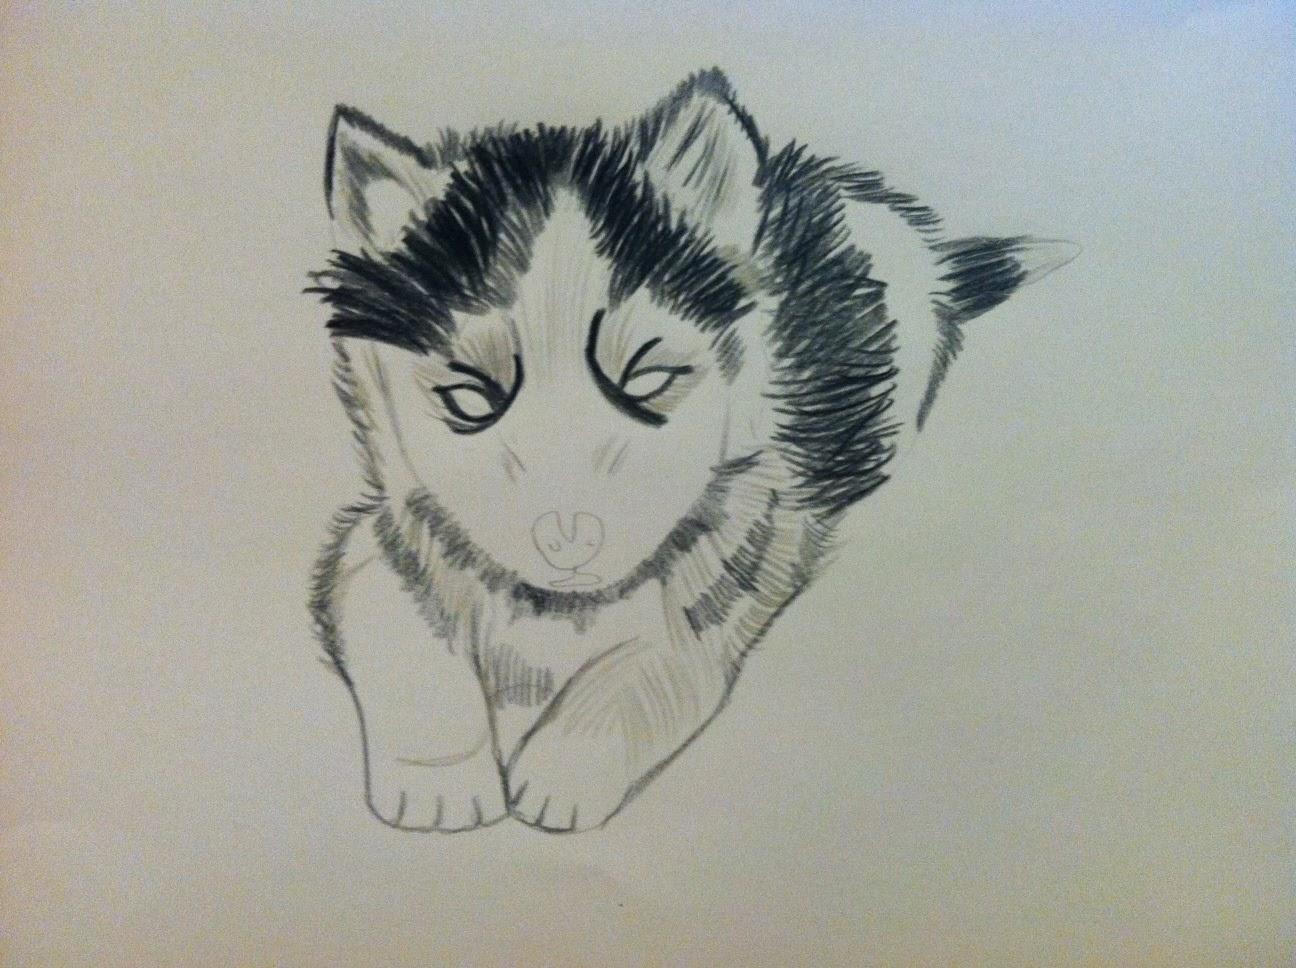 Cute Husky Puppy Drawings Drawing a husky really made meCute Husky Puppy Drawings